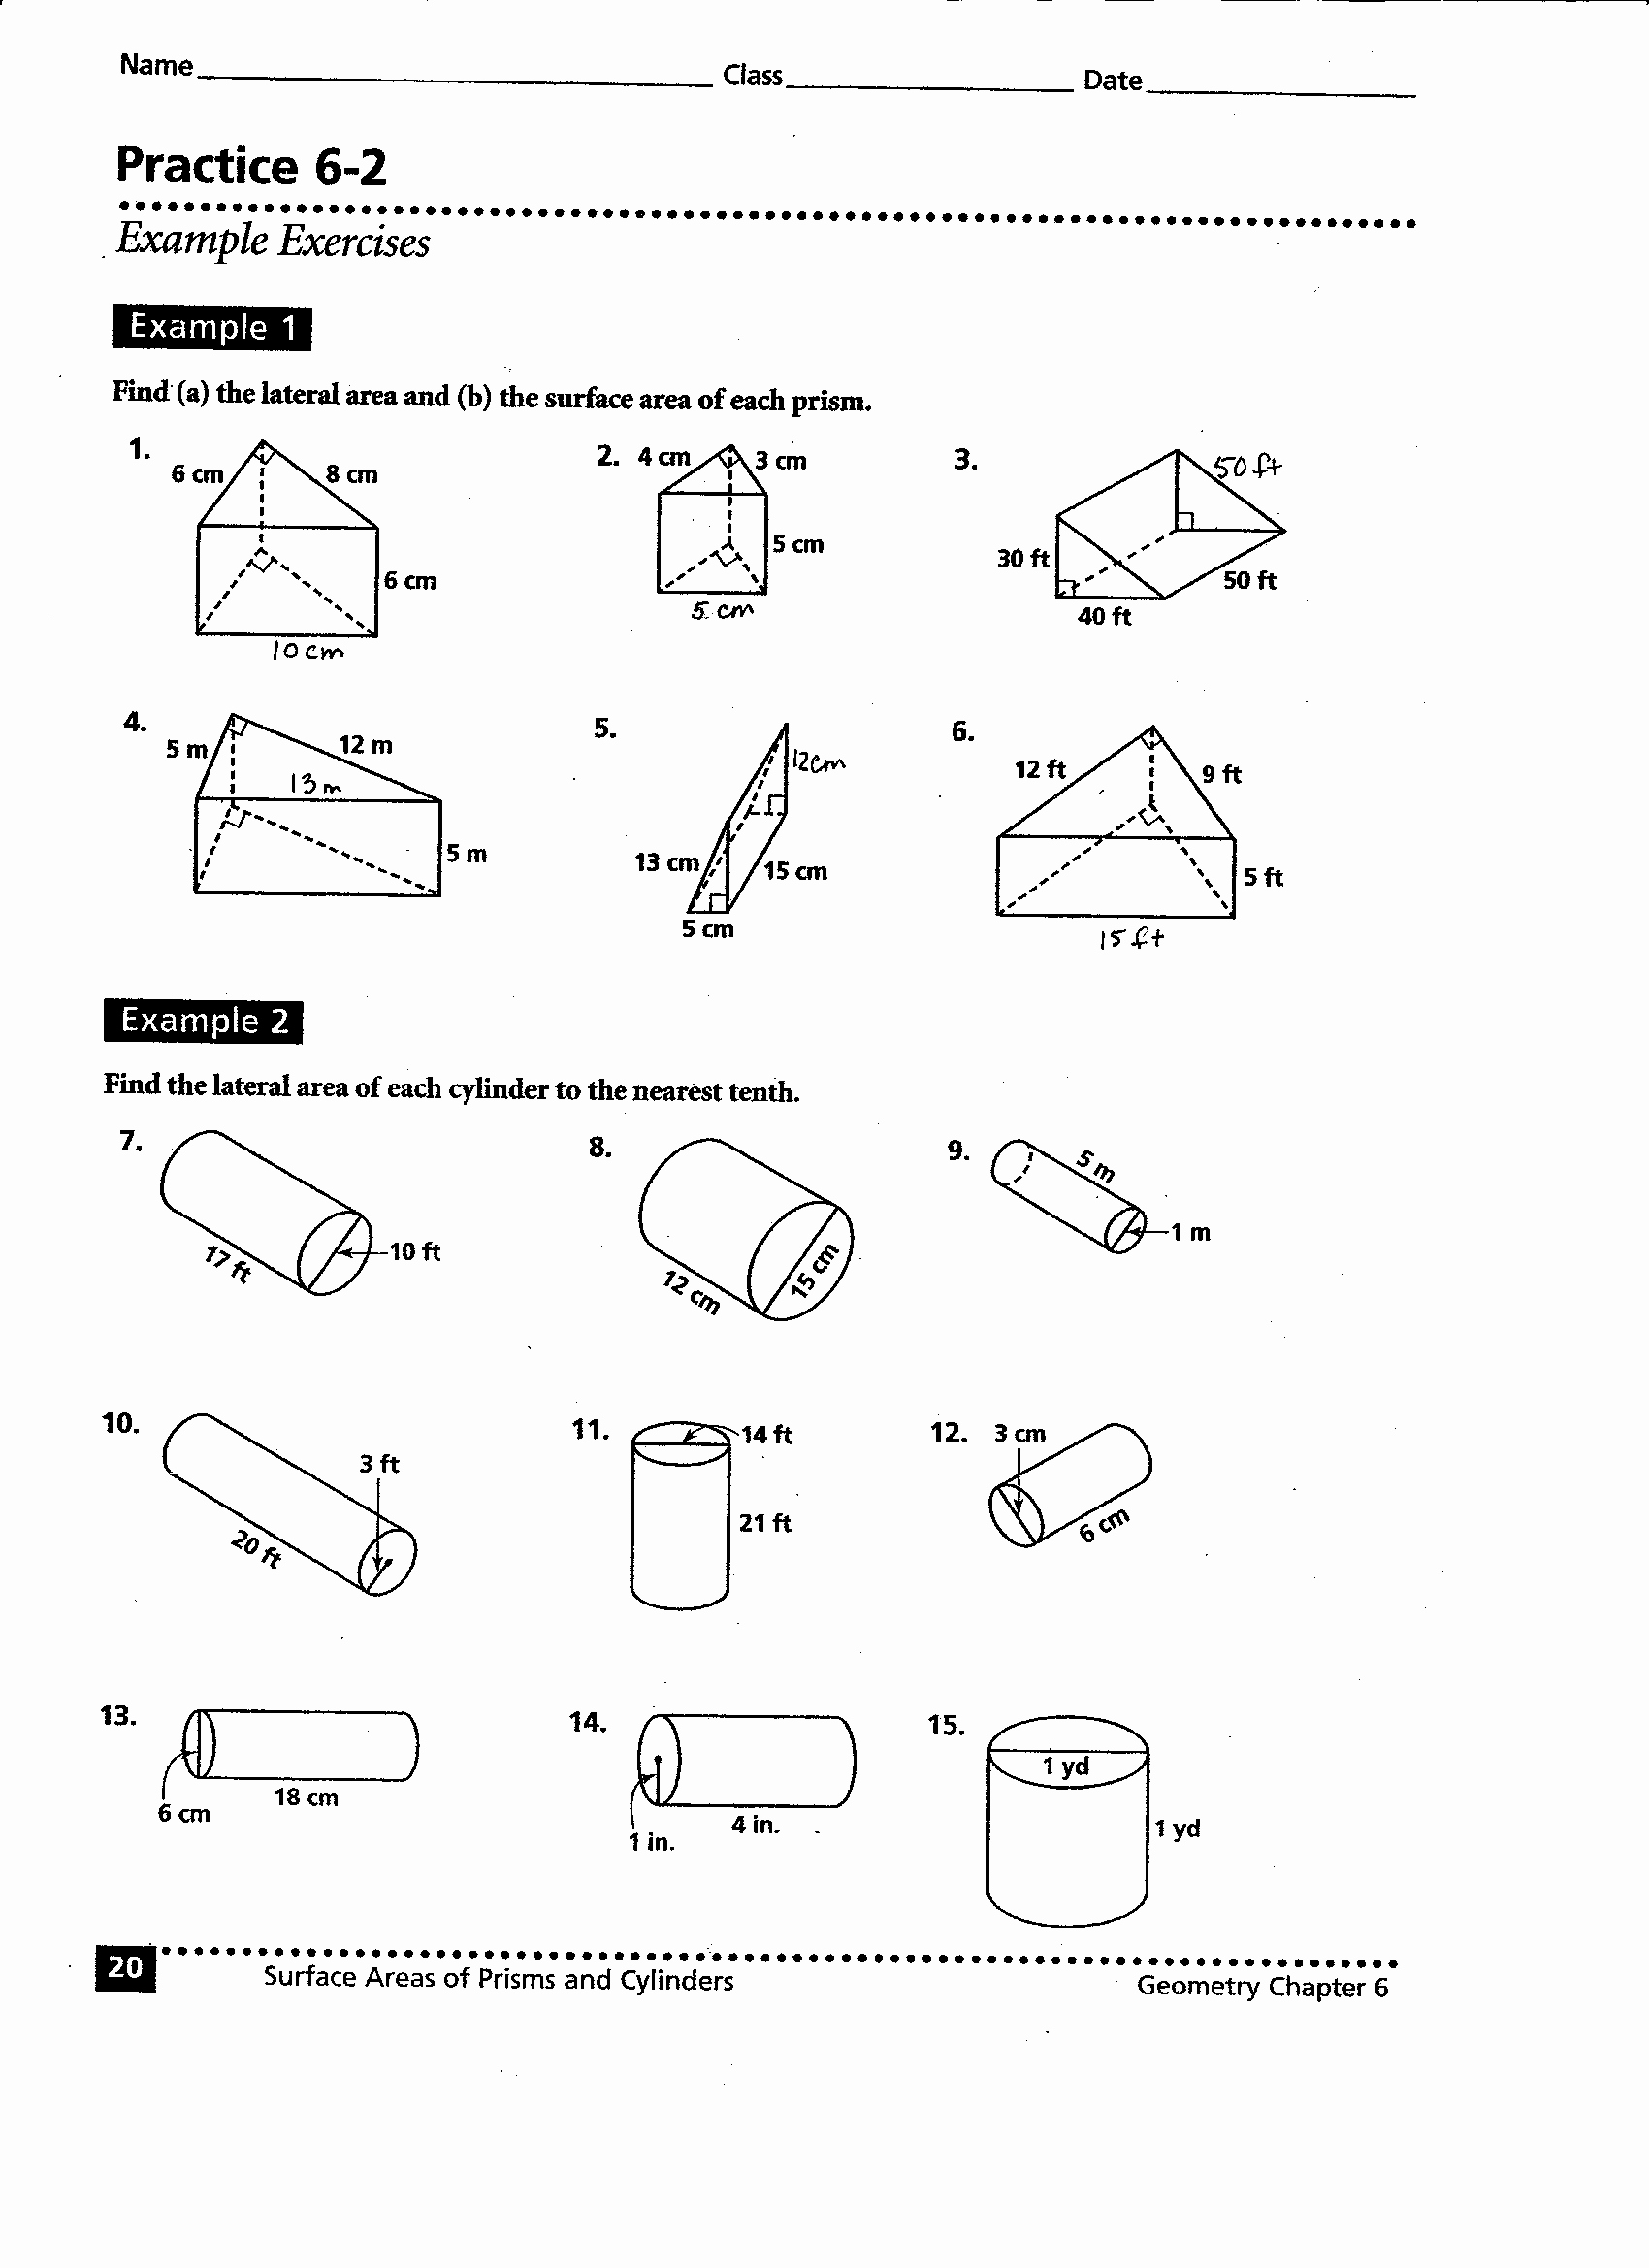 Volume Of Cylinders Worksheet Elegant 41 Volume Prisms and Cylinders Worksheet Quiz